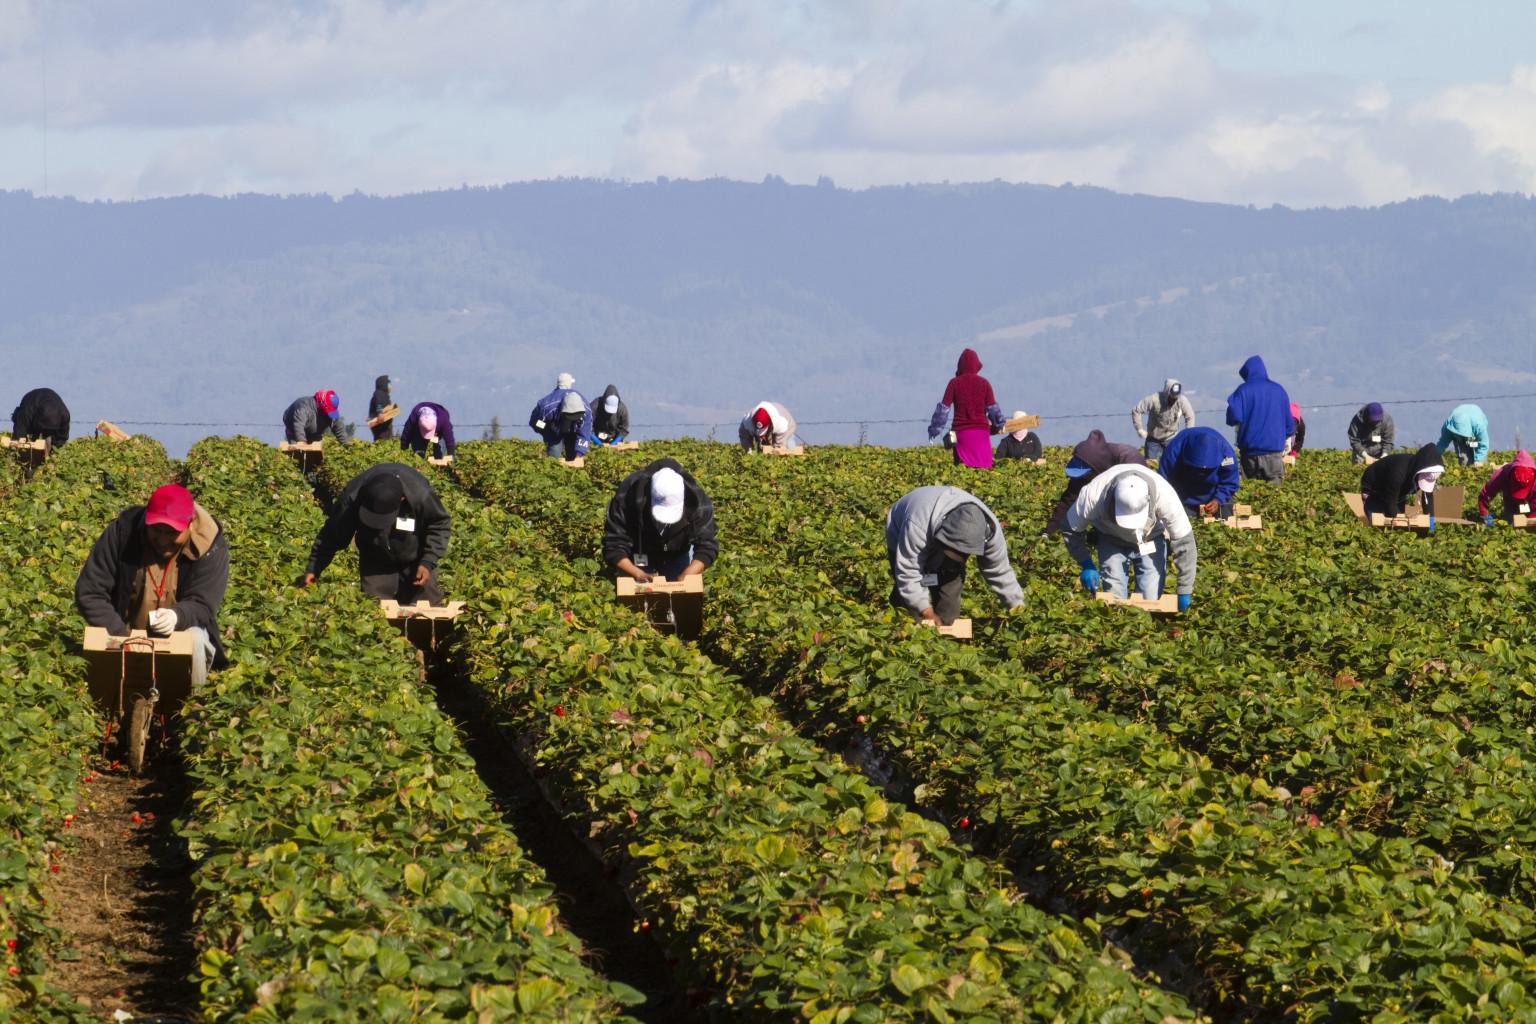 Migrant Farm Workers in Strawberry fields.